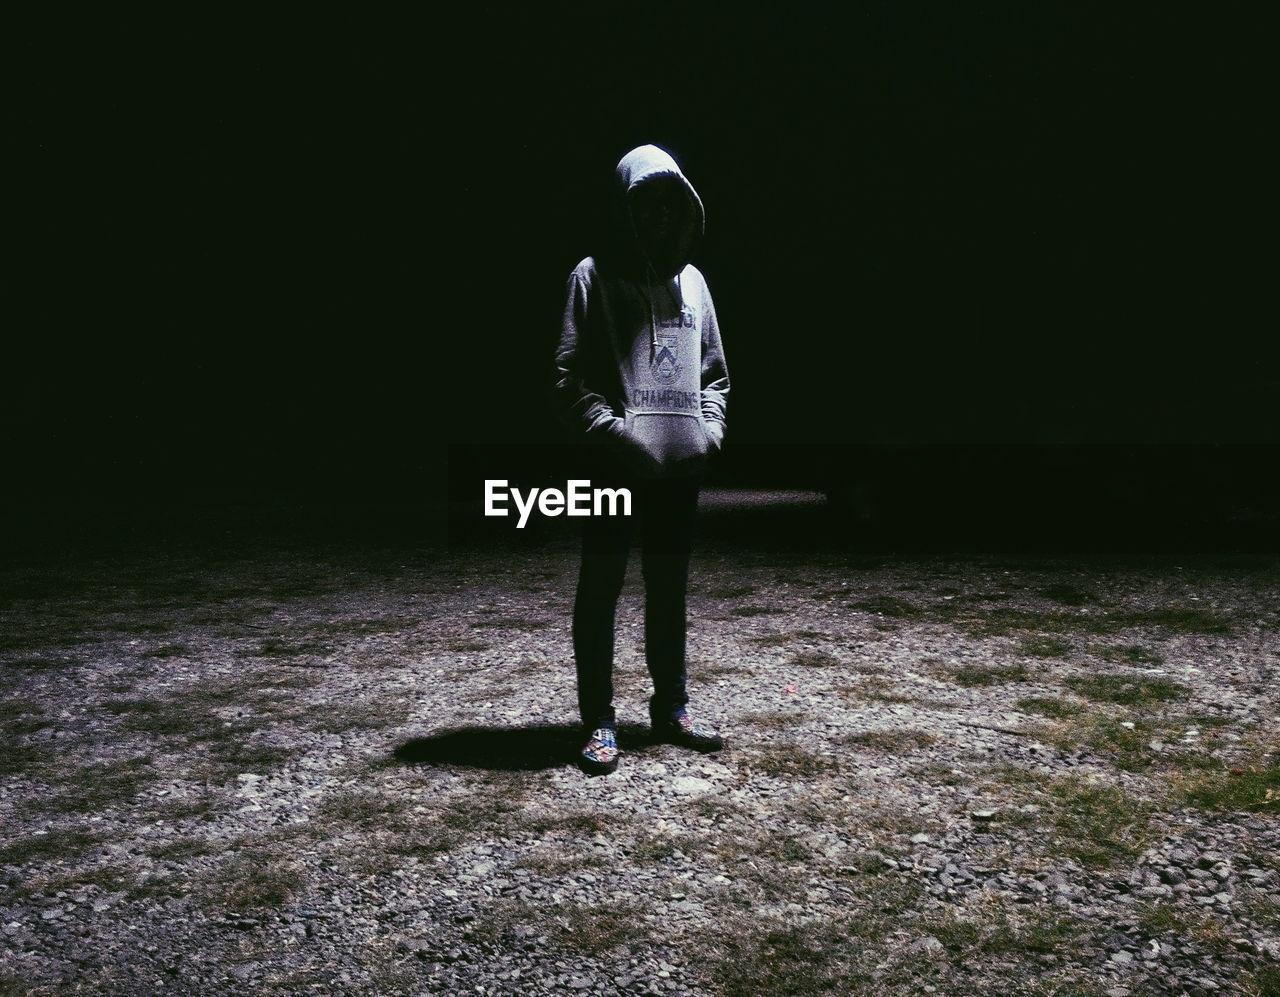 Man wearing hooded sweatshirt standing on illuminated ground